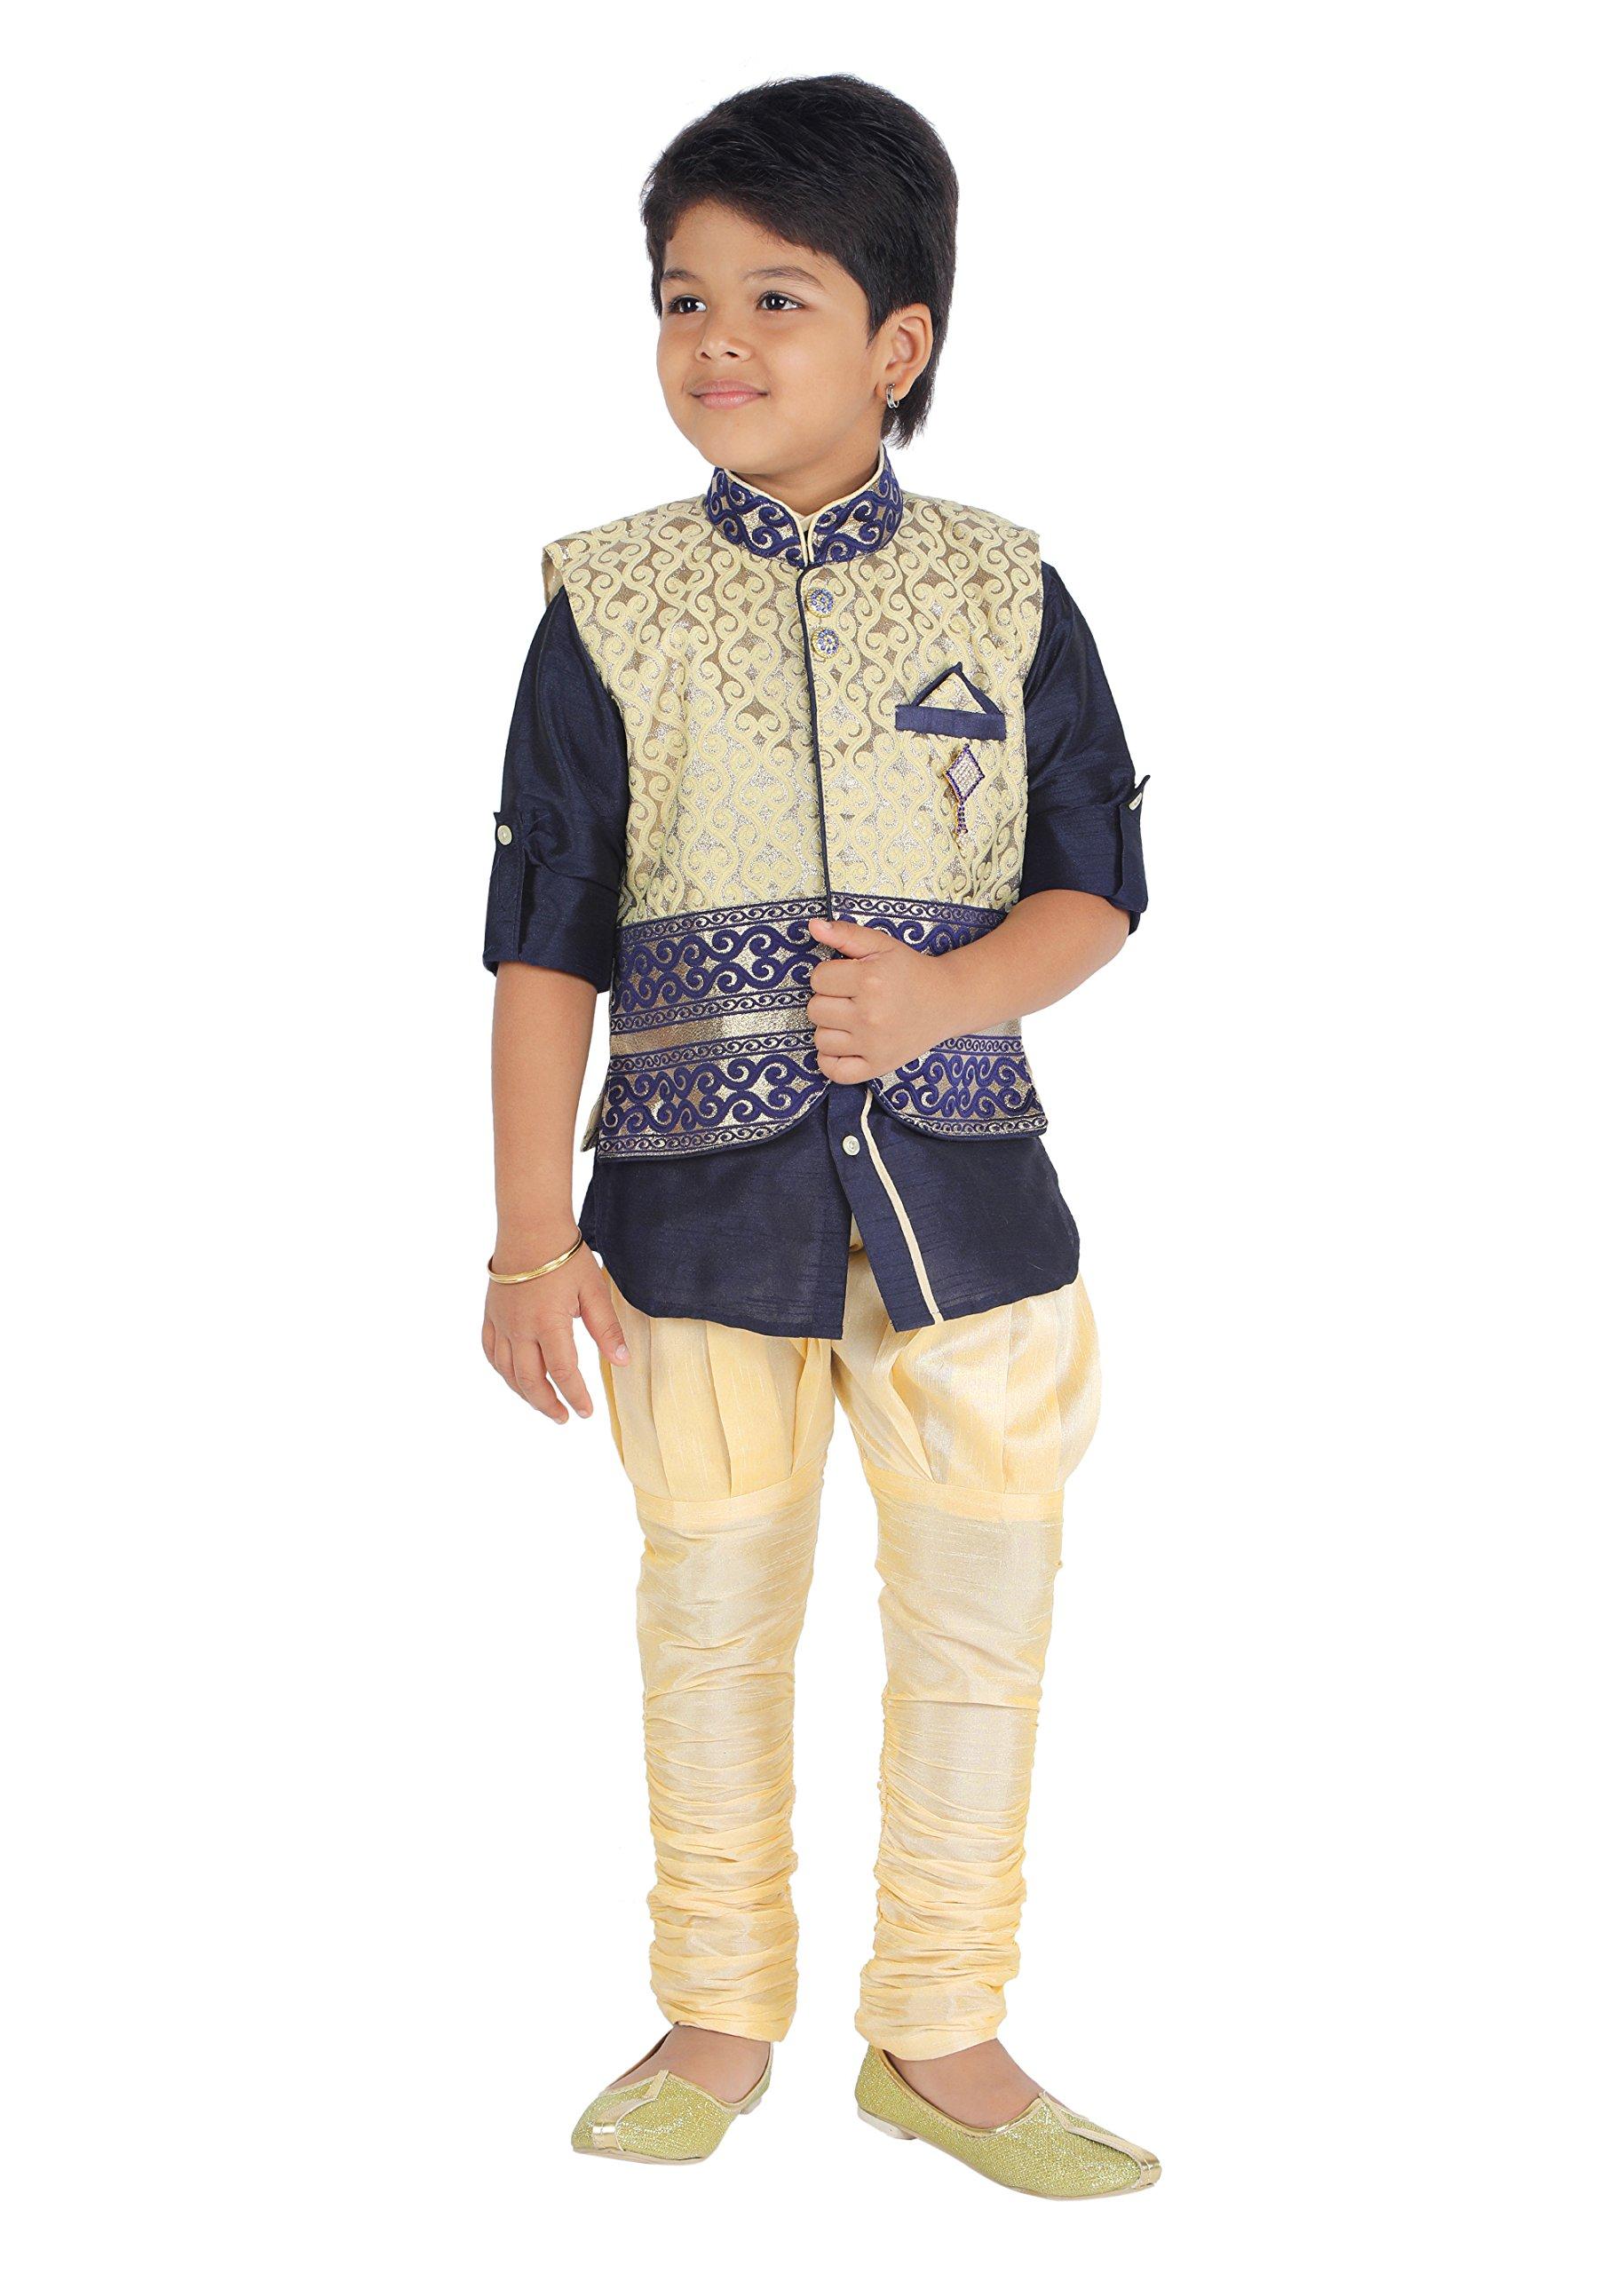 KLAUD ZEE Kids Ethnic Baby Boys' Indo Western Silk Festive and Party Wear Sherwani, Payjama Waistcoat Pant Set 6-7 Years, NAvy